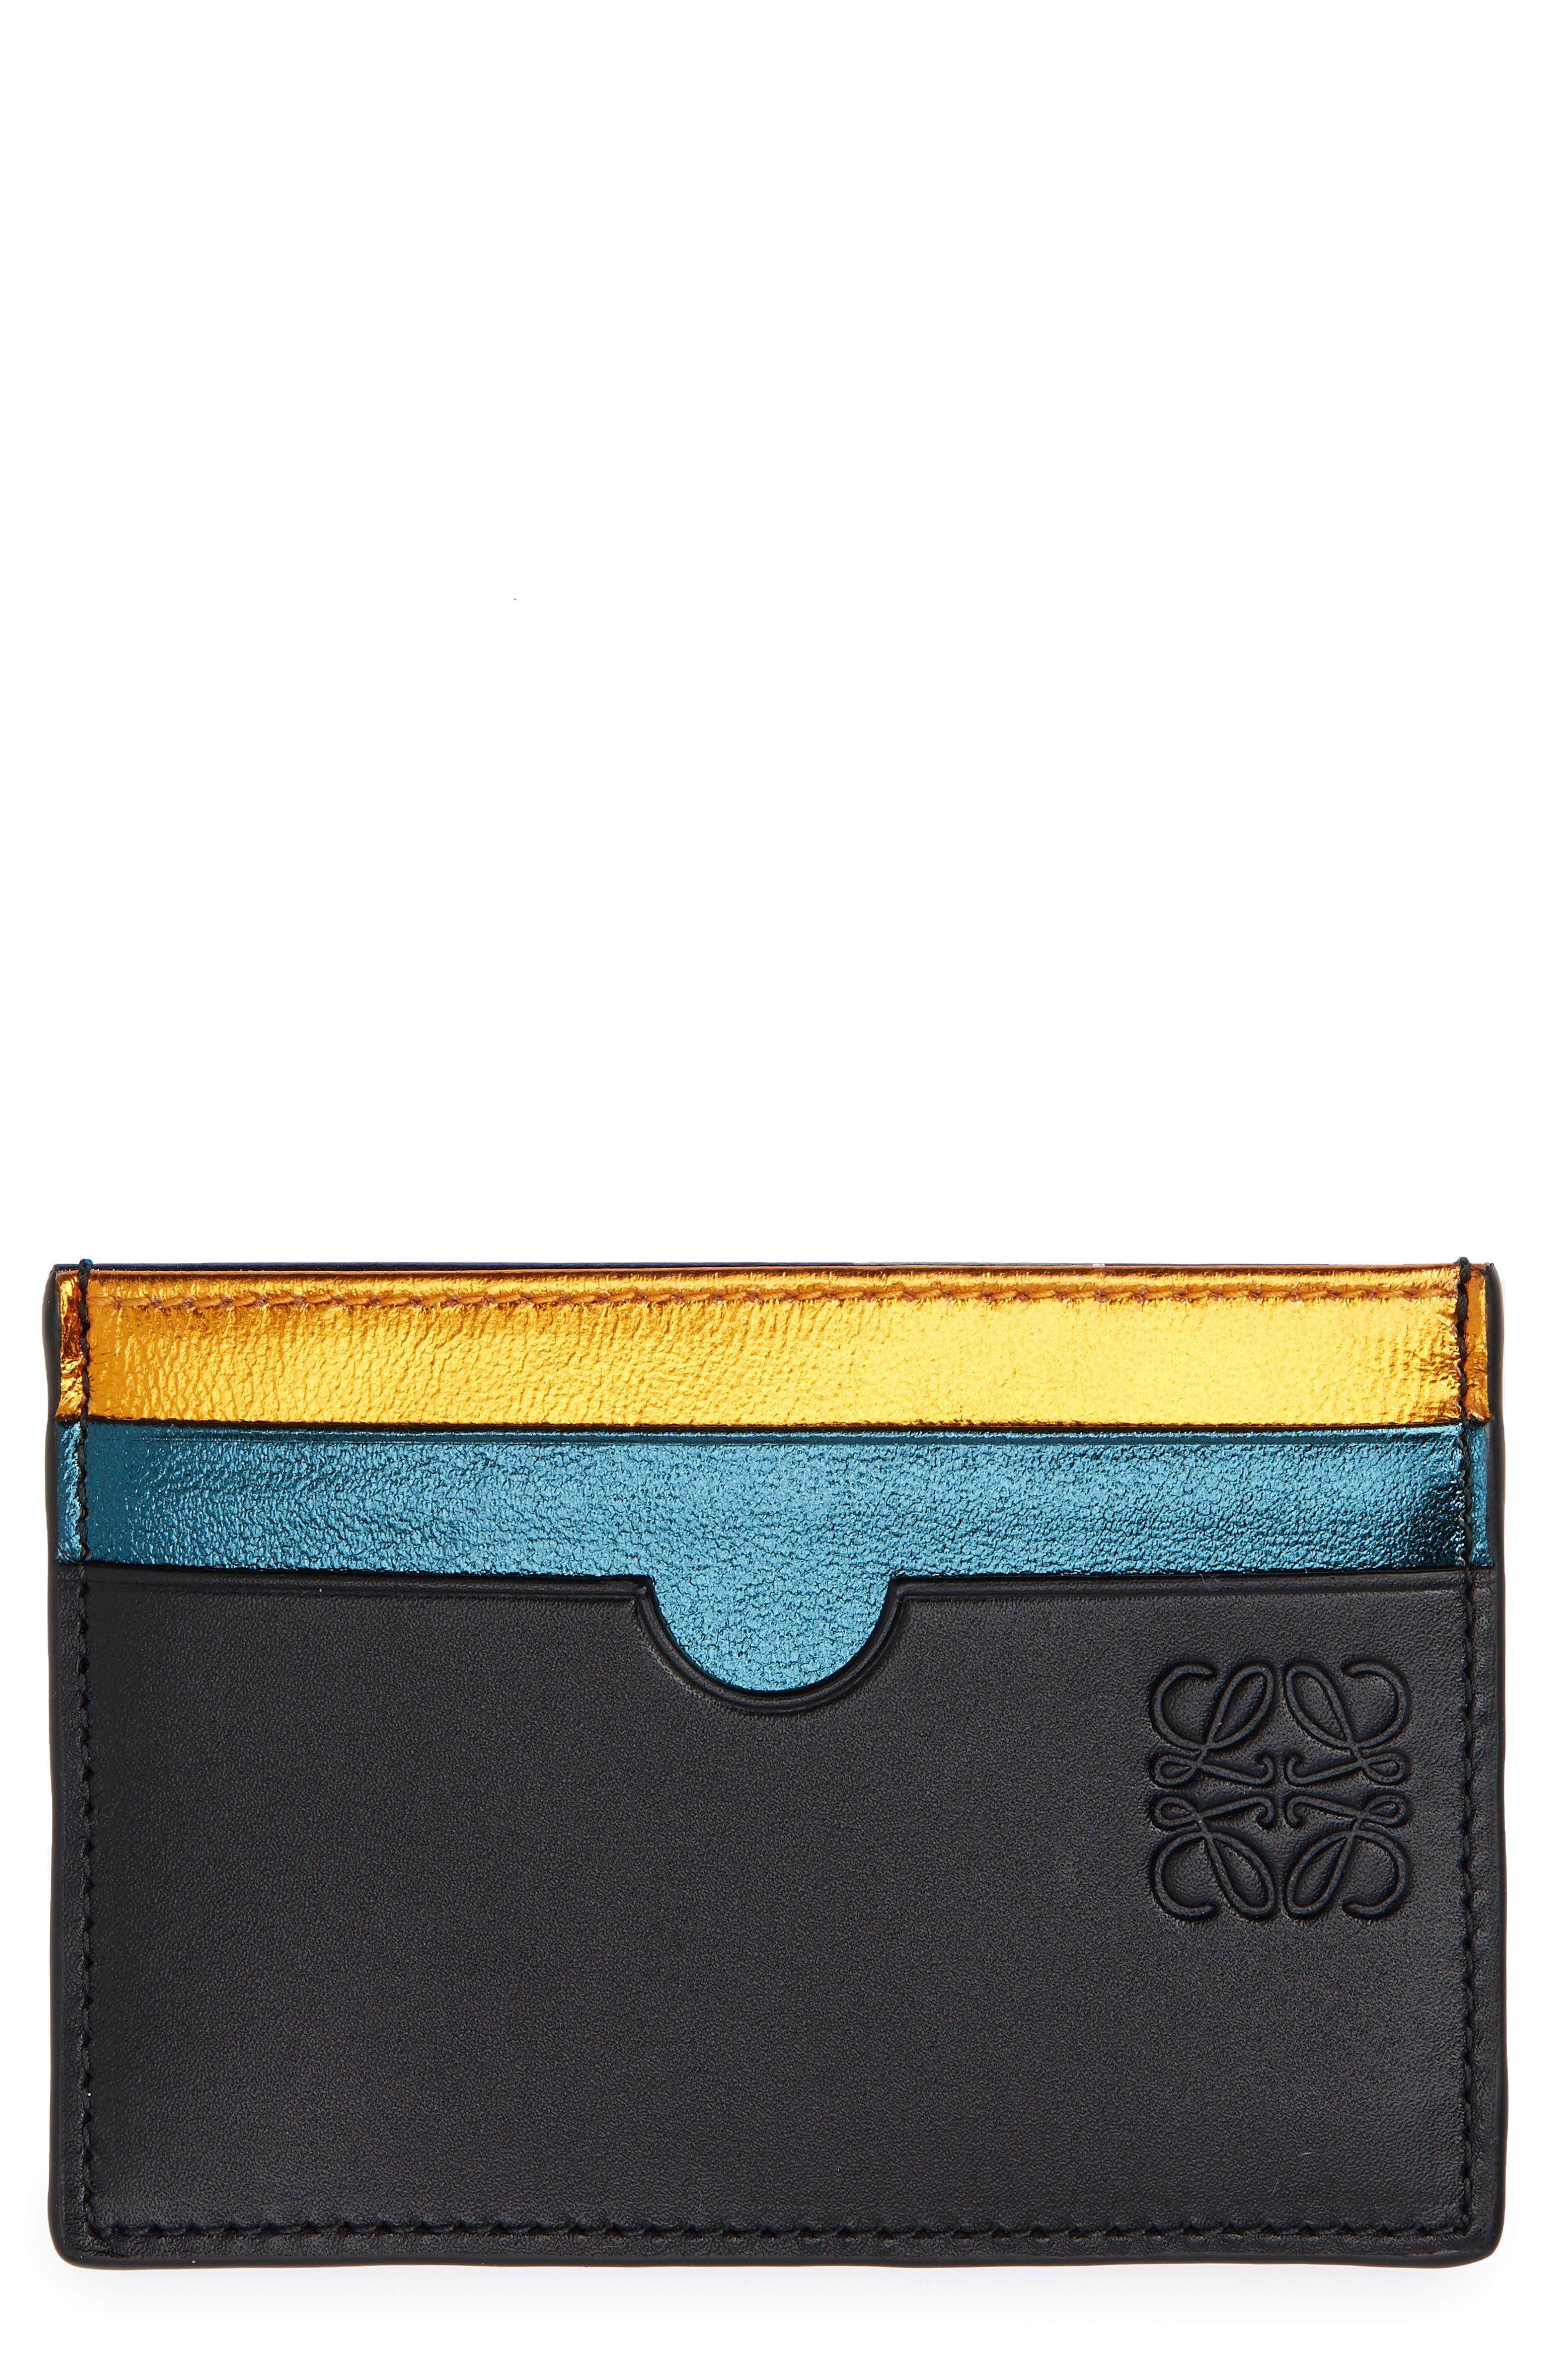 Rainbow Plain Card Case,                         Main,                         color, METALLIC BLACK MULTI